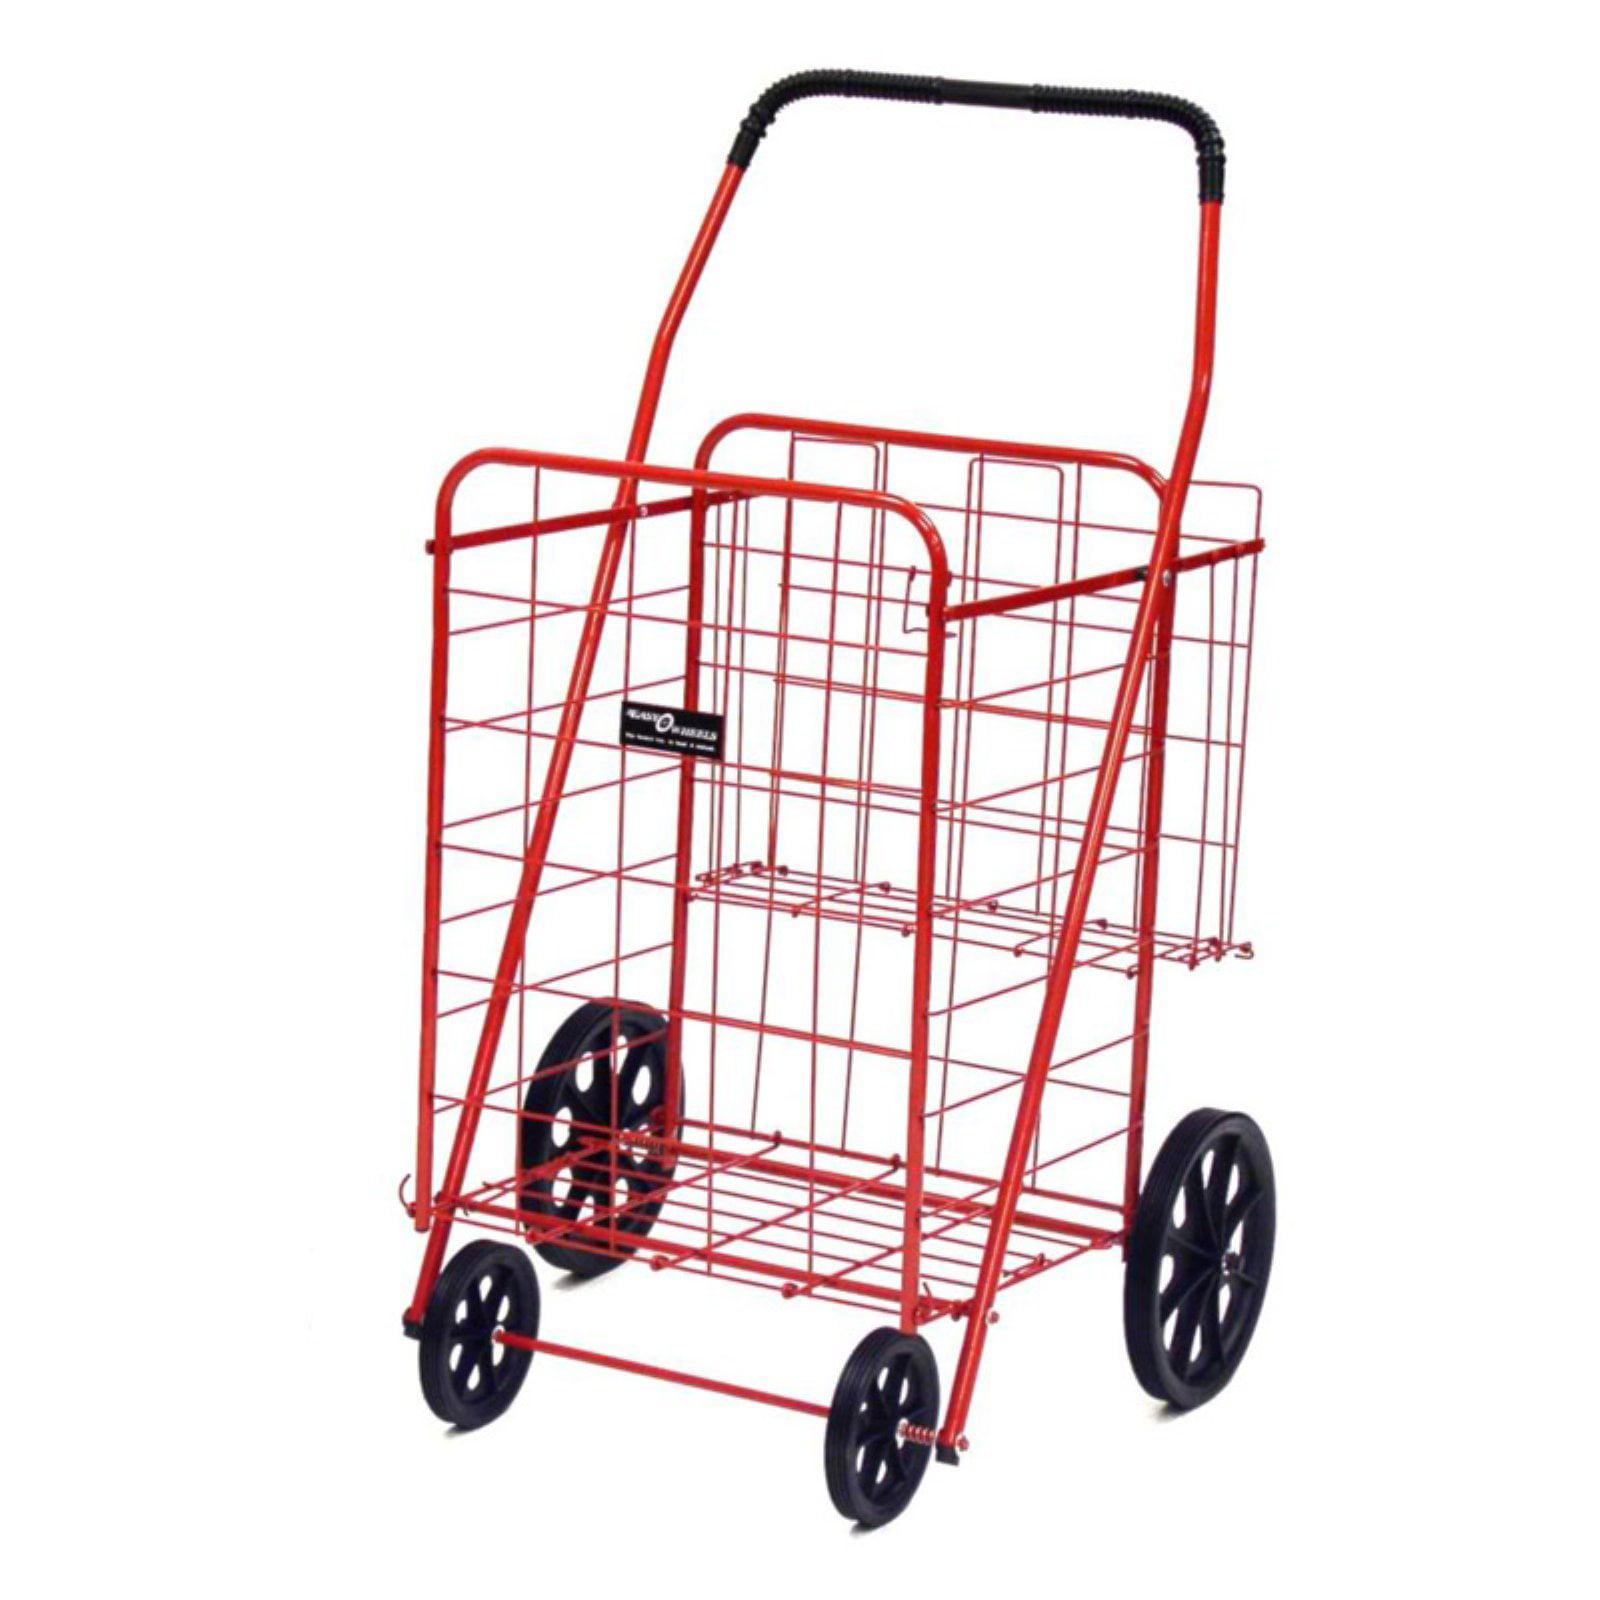 Easy Wheels Jumbo Shopping Cart Plus - Multiple Colors